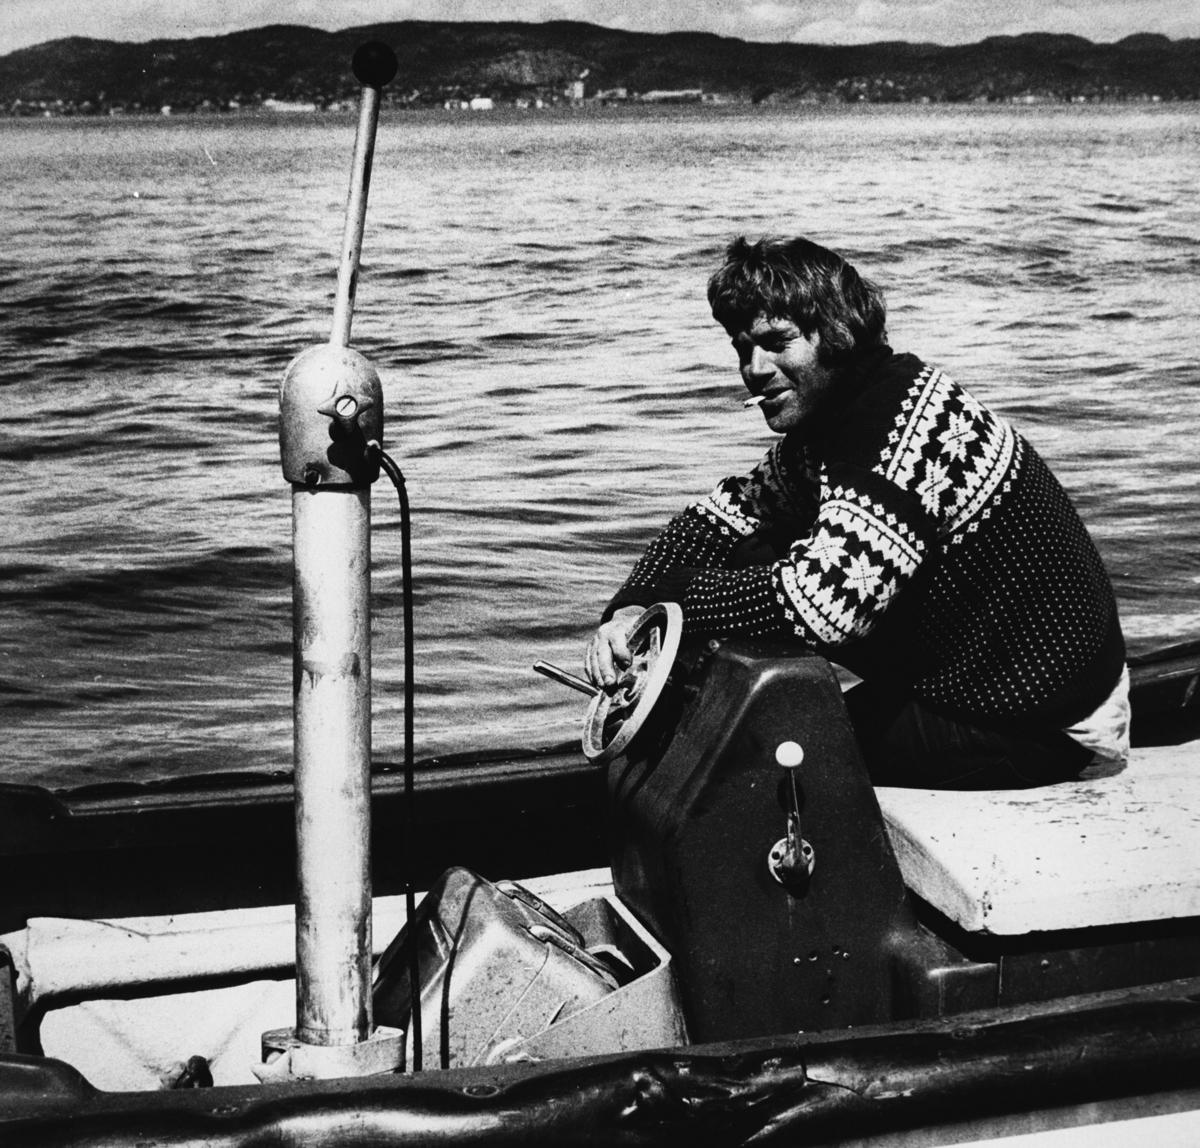 Mann sitter ved ror ombord på båt.